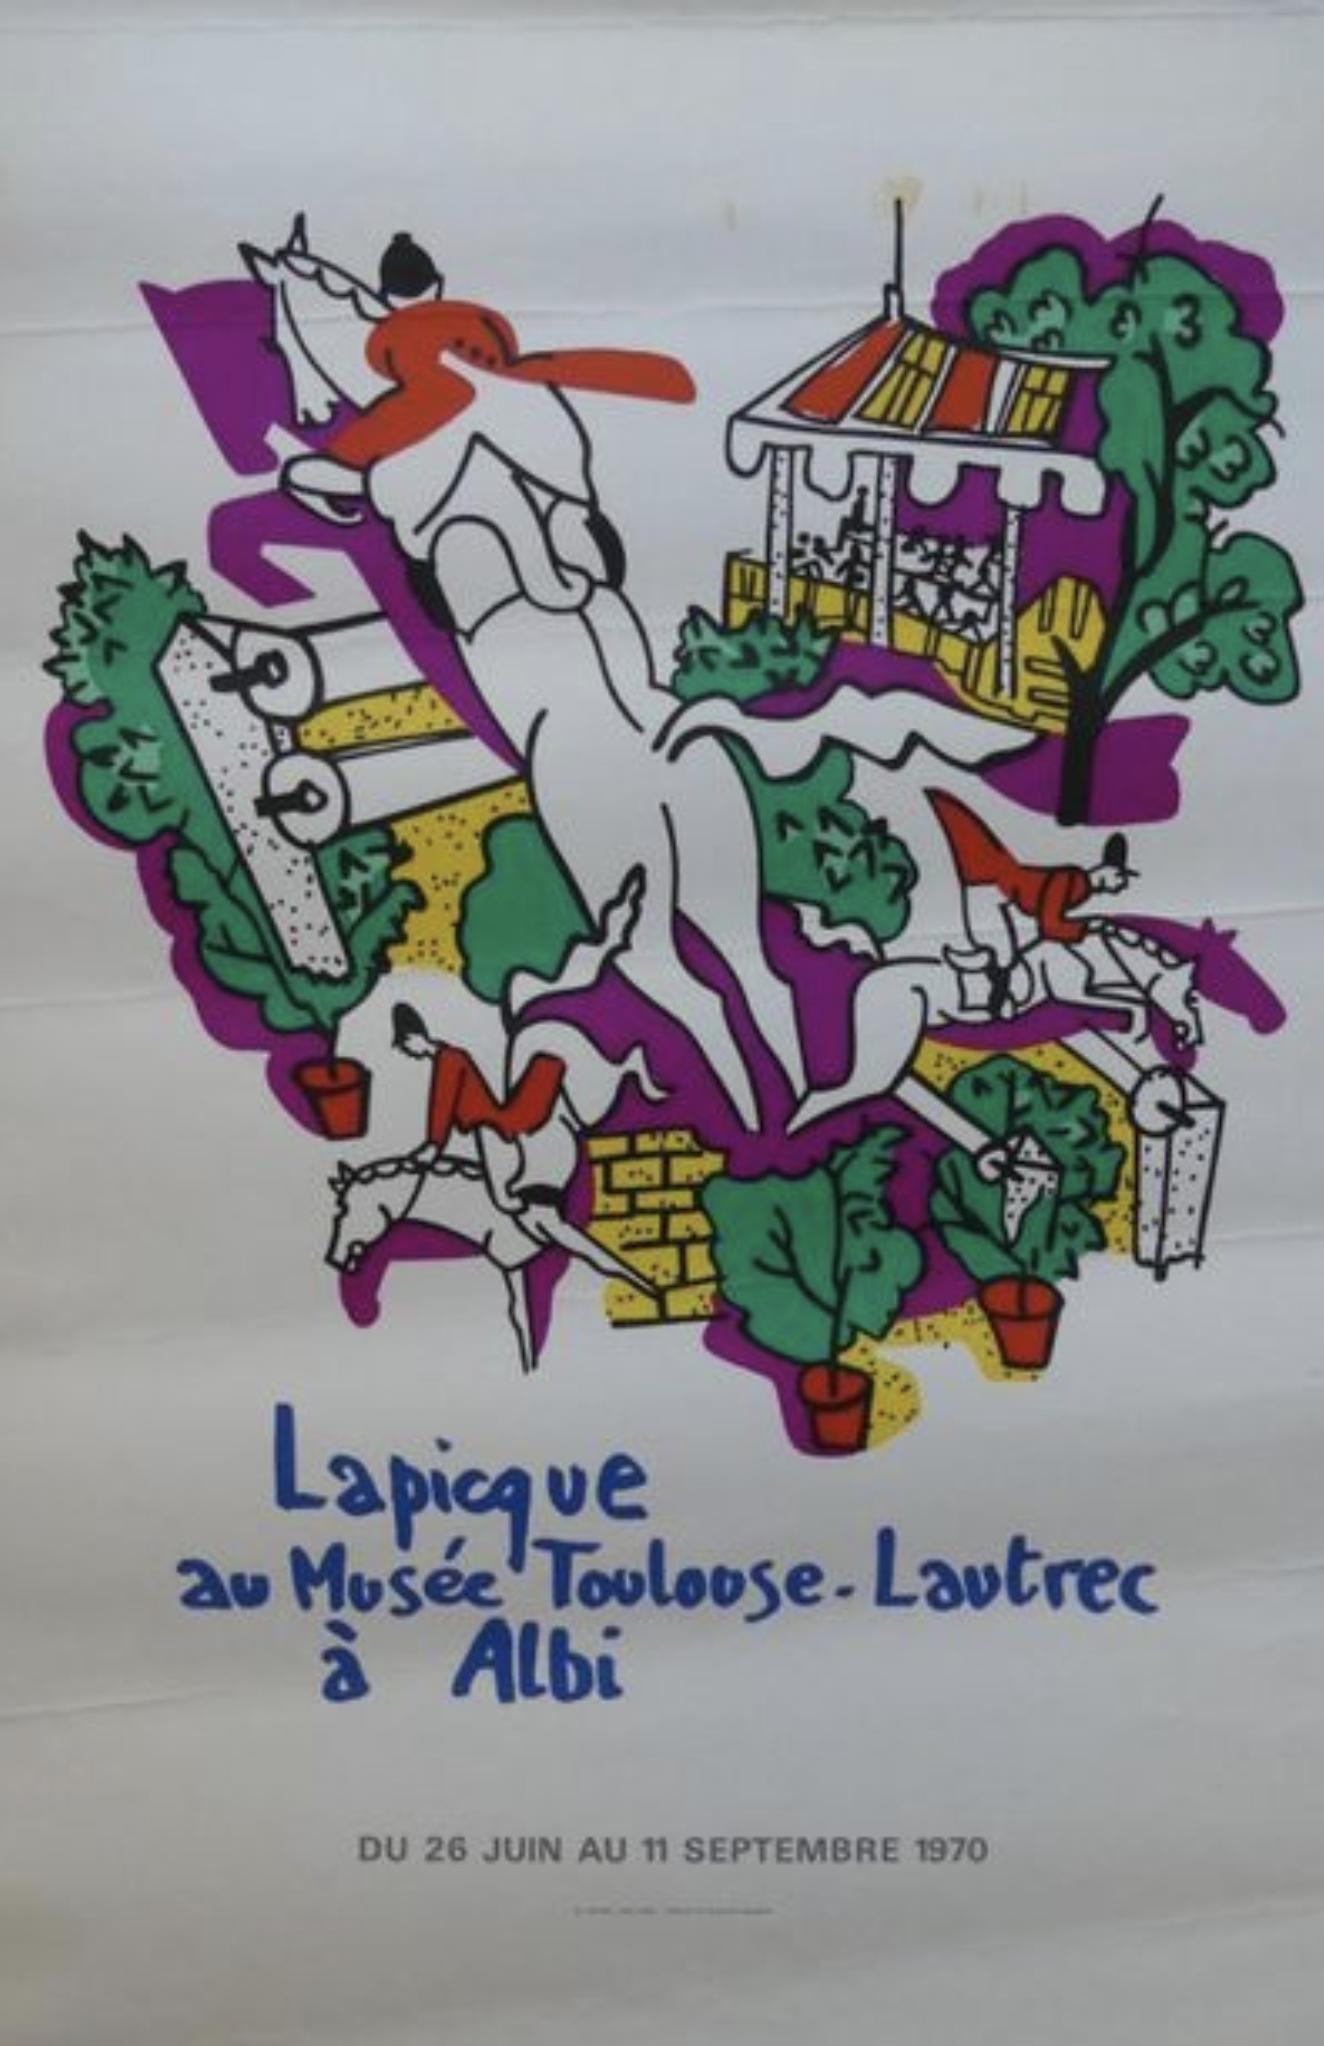 Lapicque Au Musee Touloose-Lautrec Original Vintage Poster